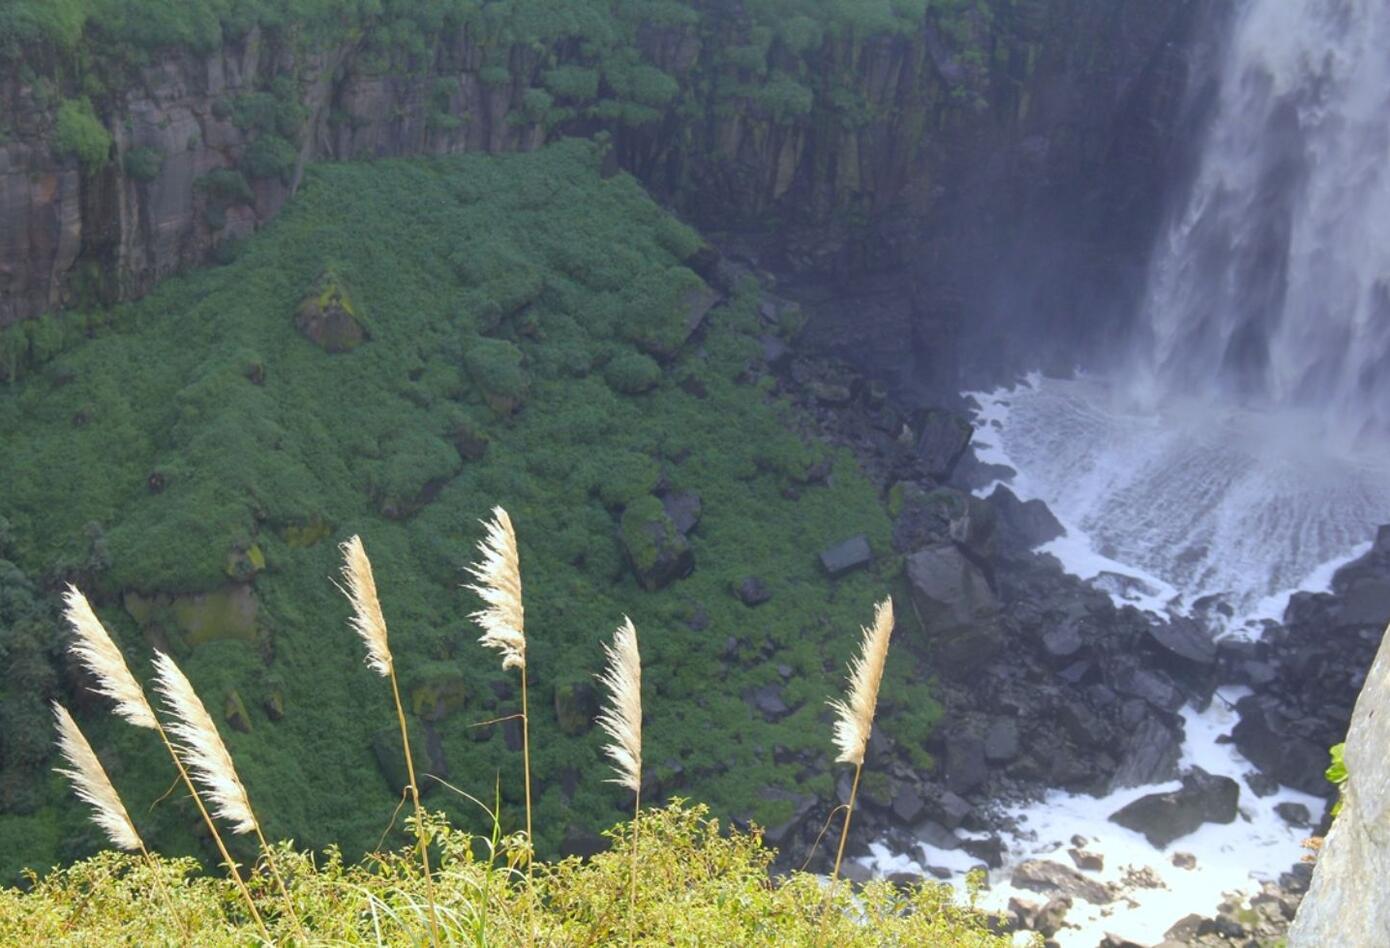 Esta es una iniciativa que se promueve para proteger los paisajes del país.